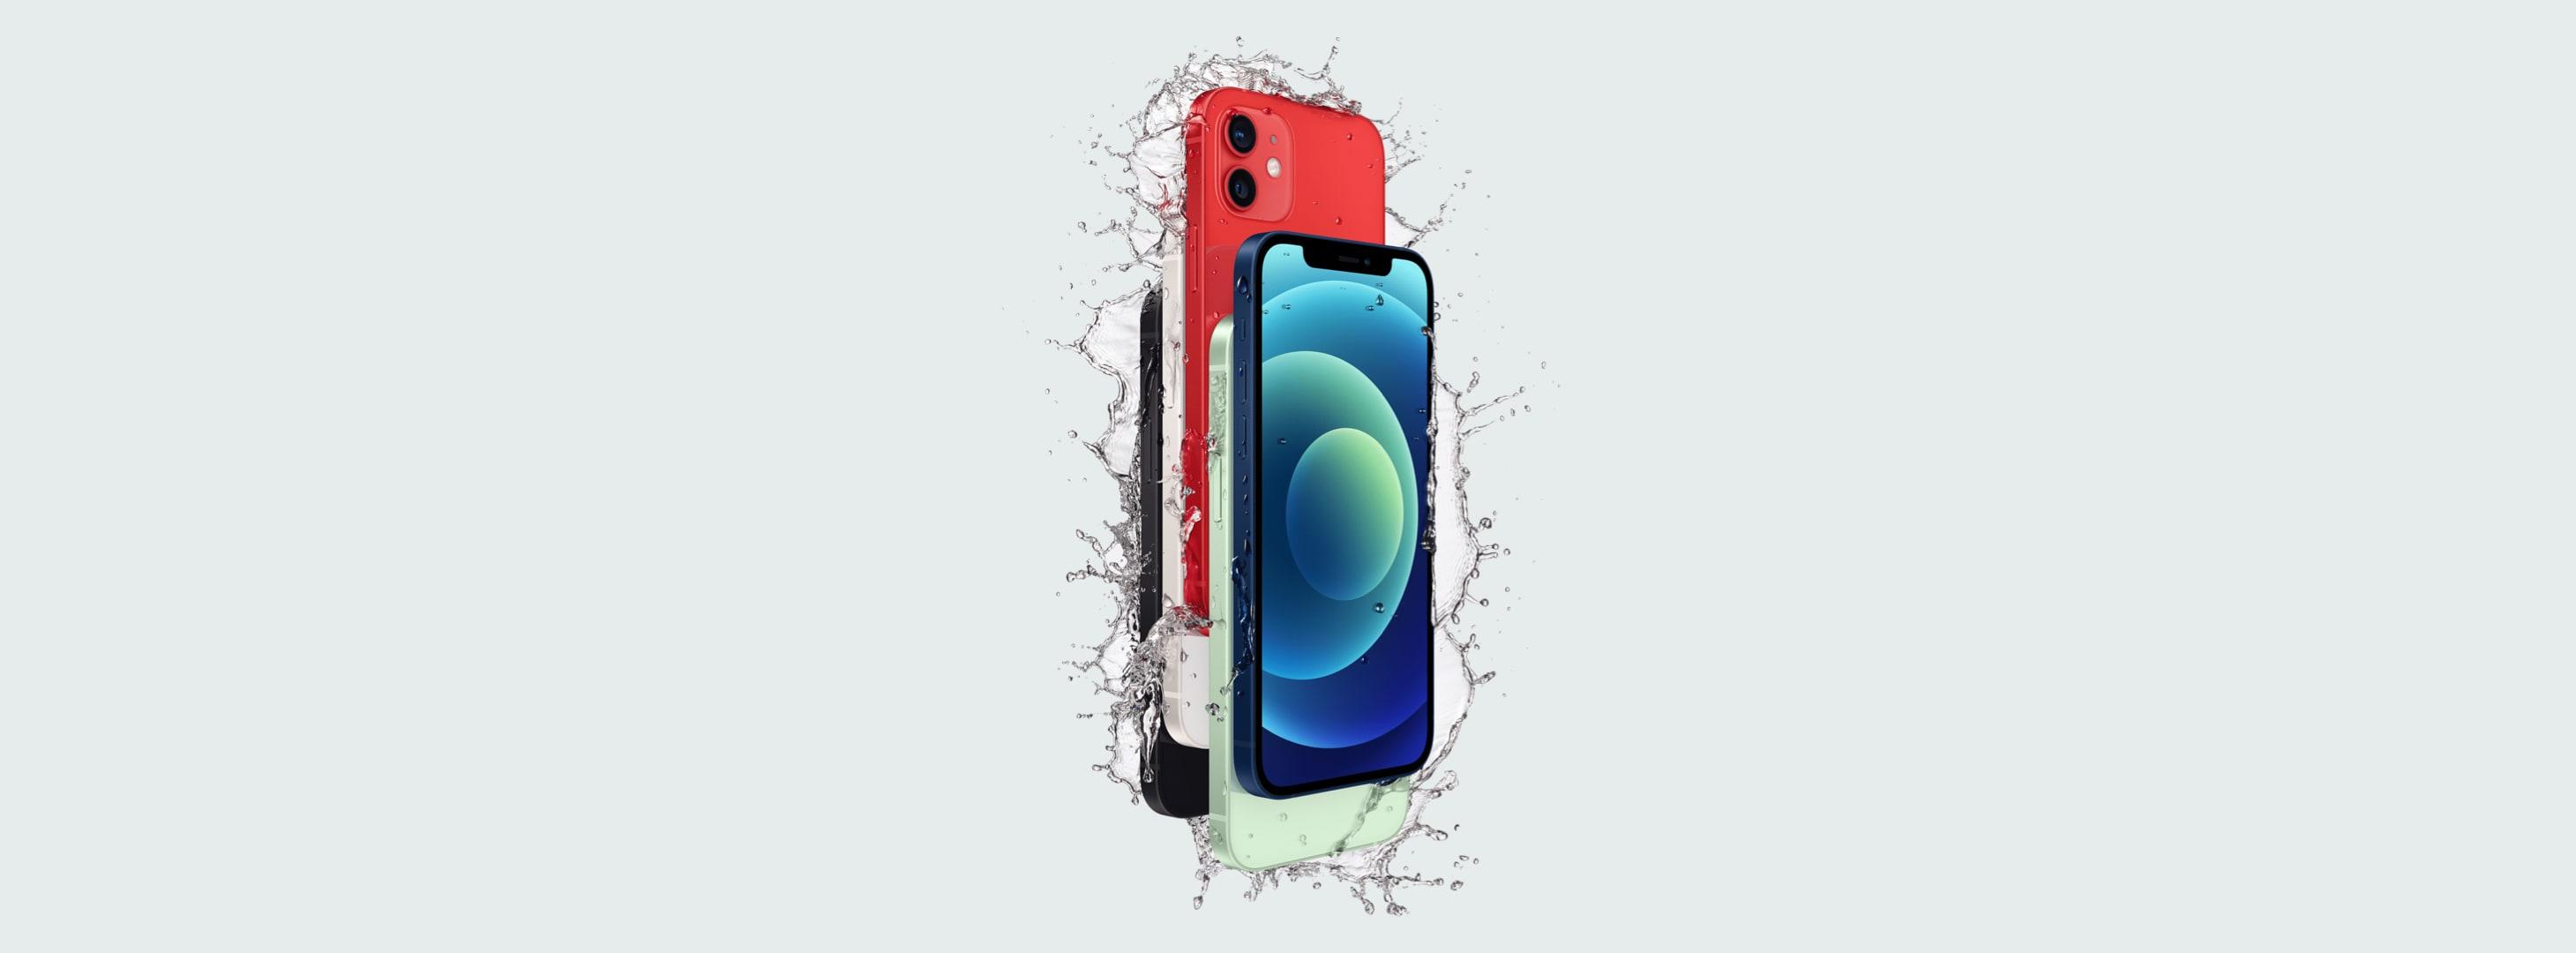 allapplenews-iphone-12-in-water